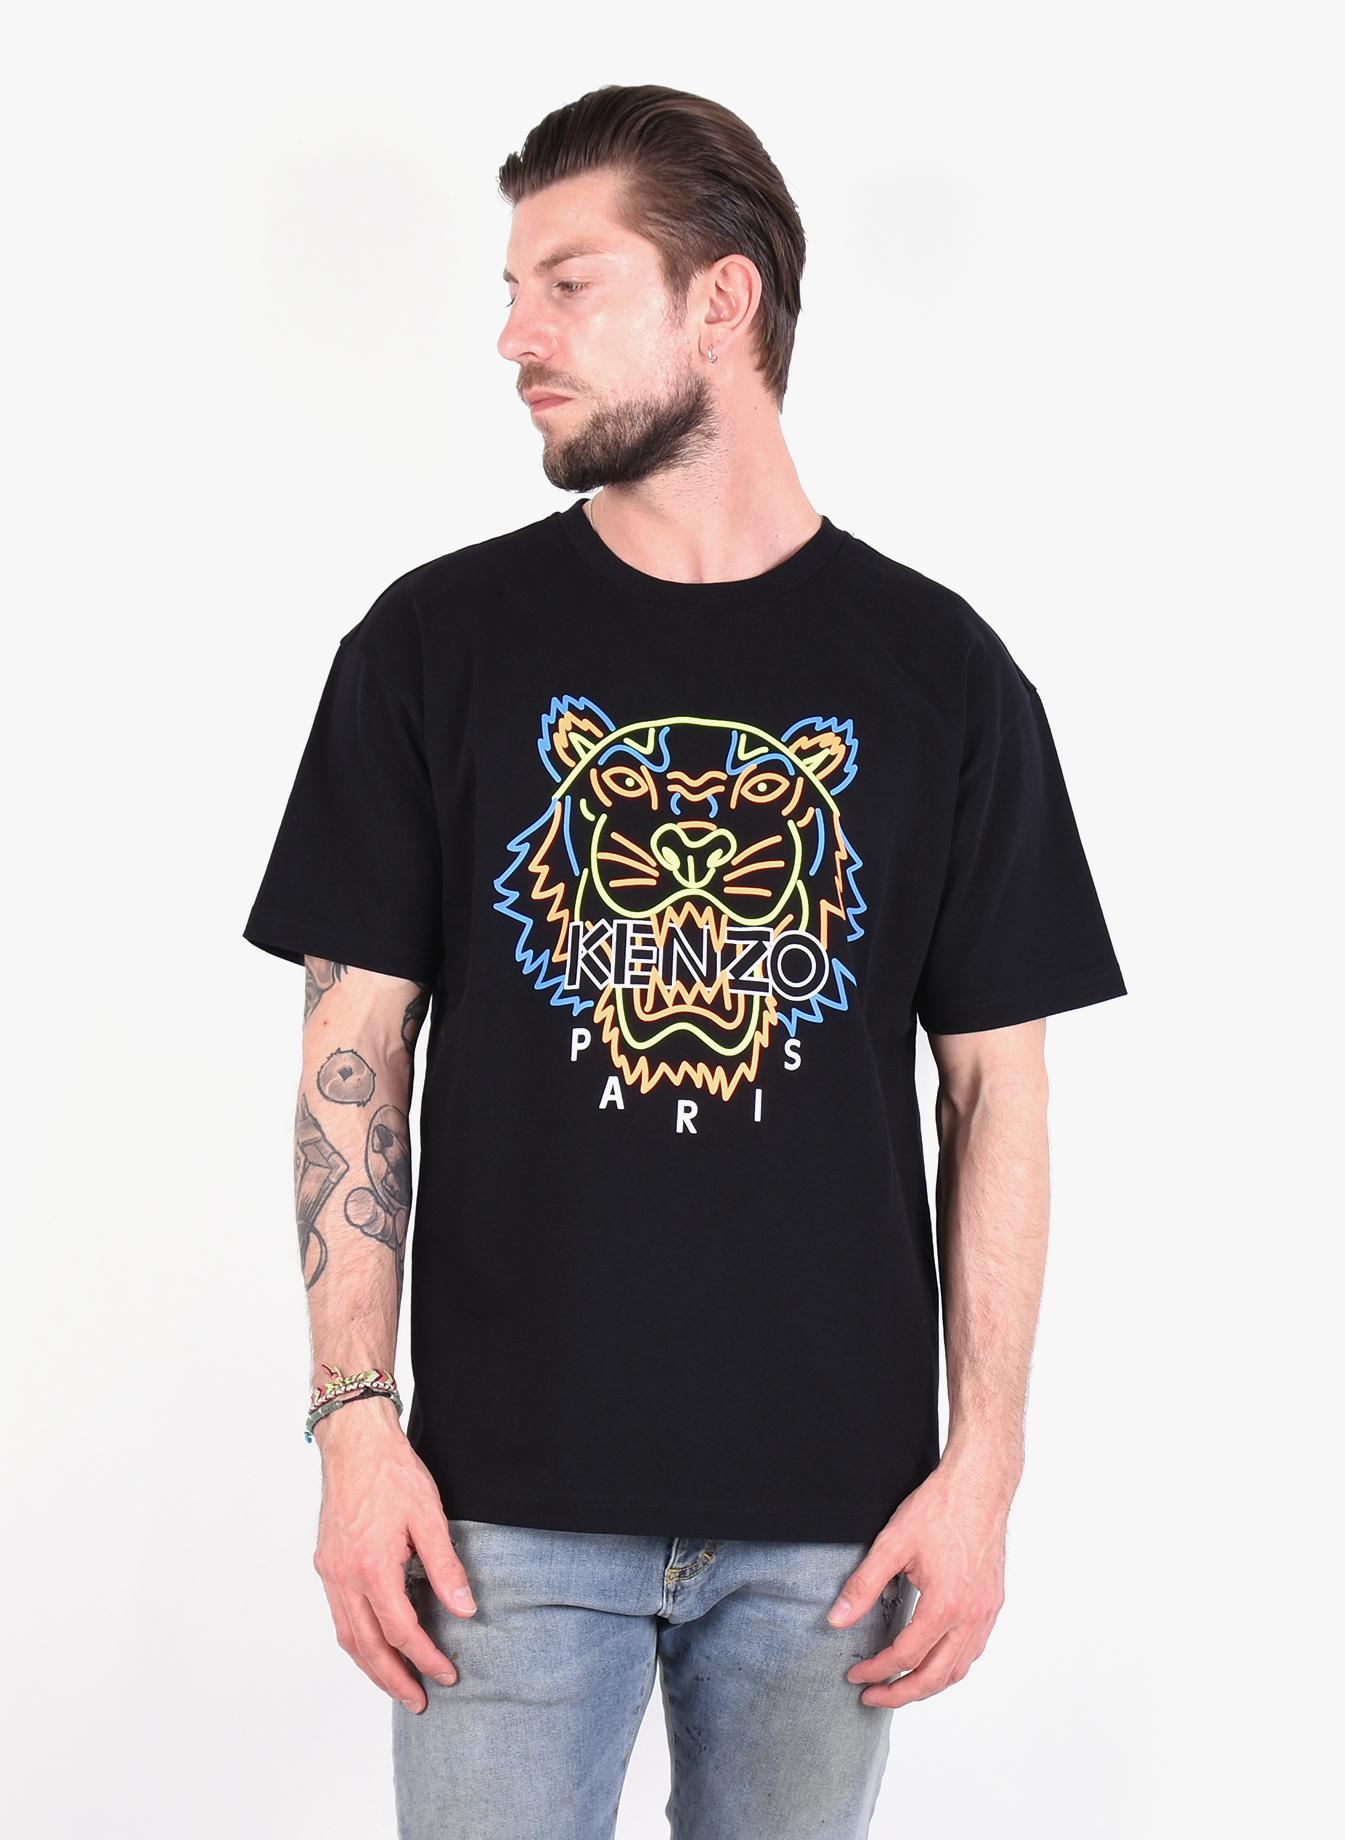 f54bad53 Kenzo Paris 'Neon Tiger' T-Shirt Black - Mensquare